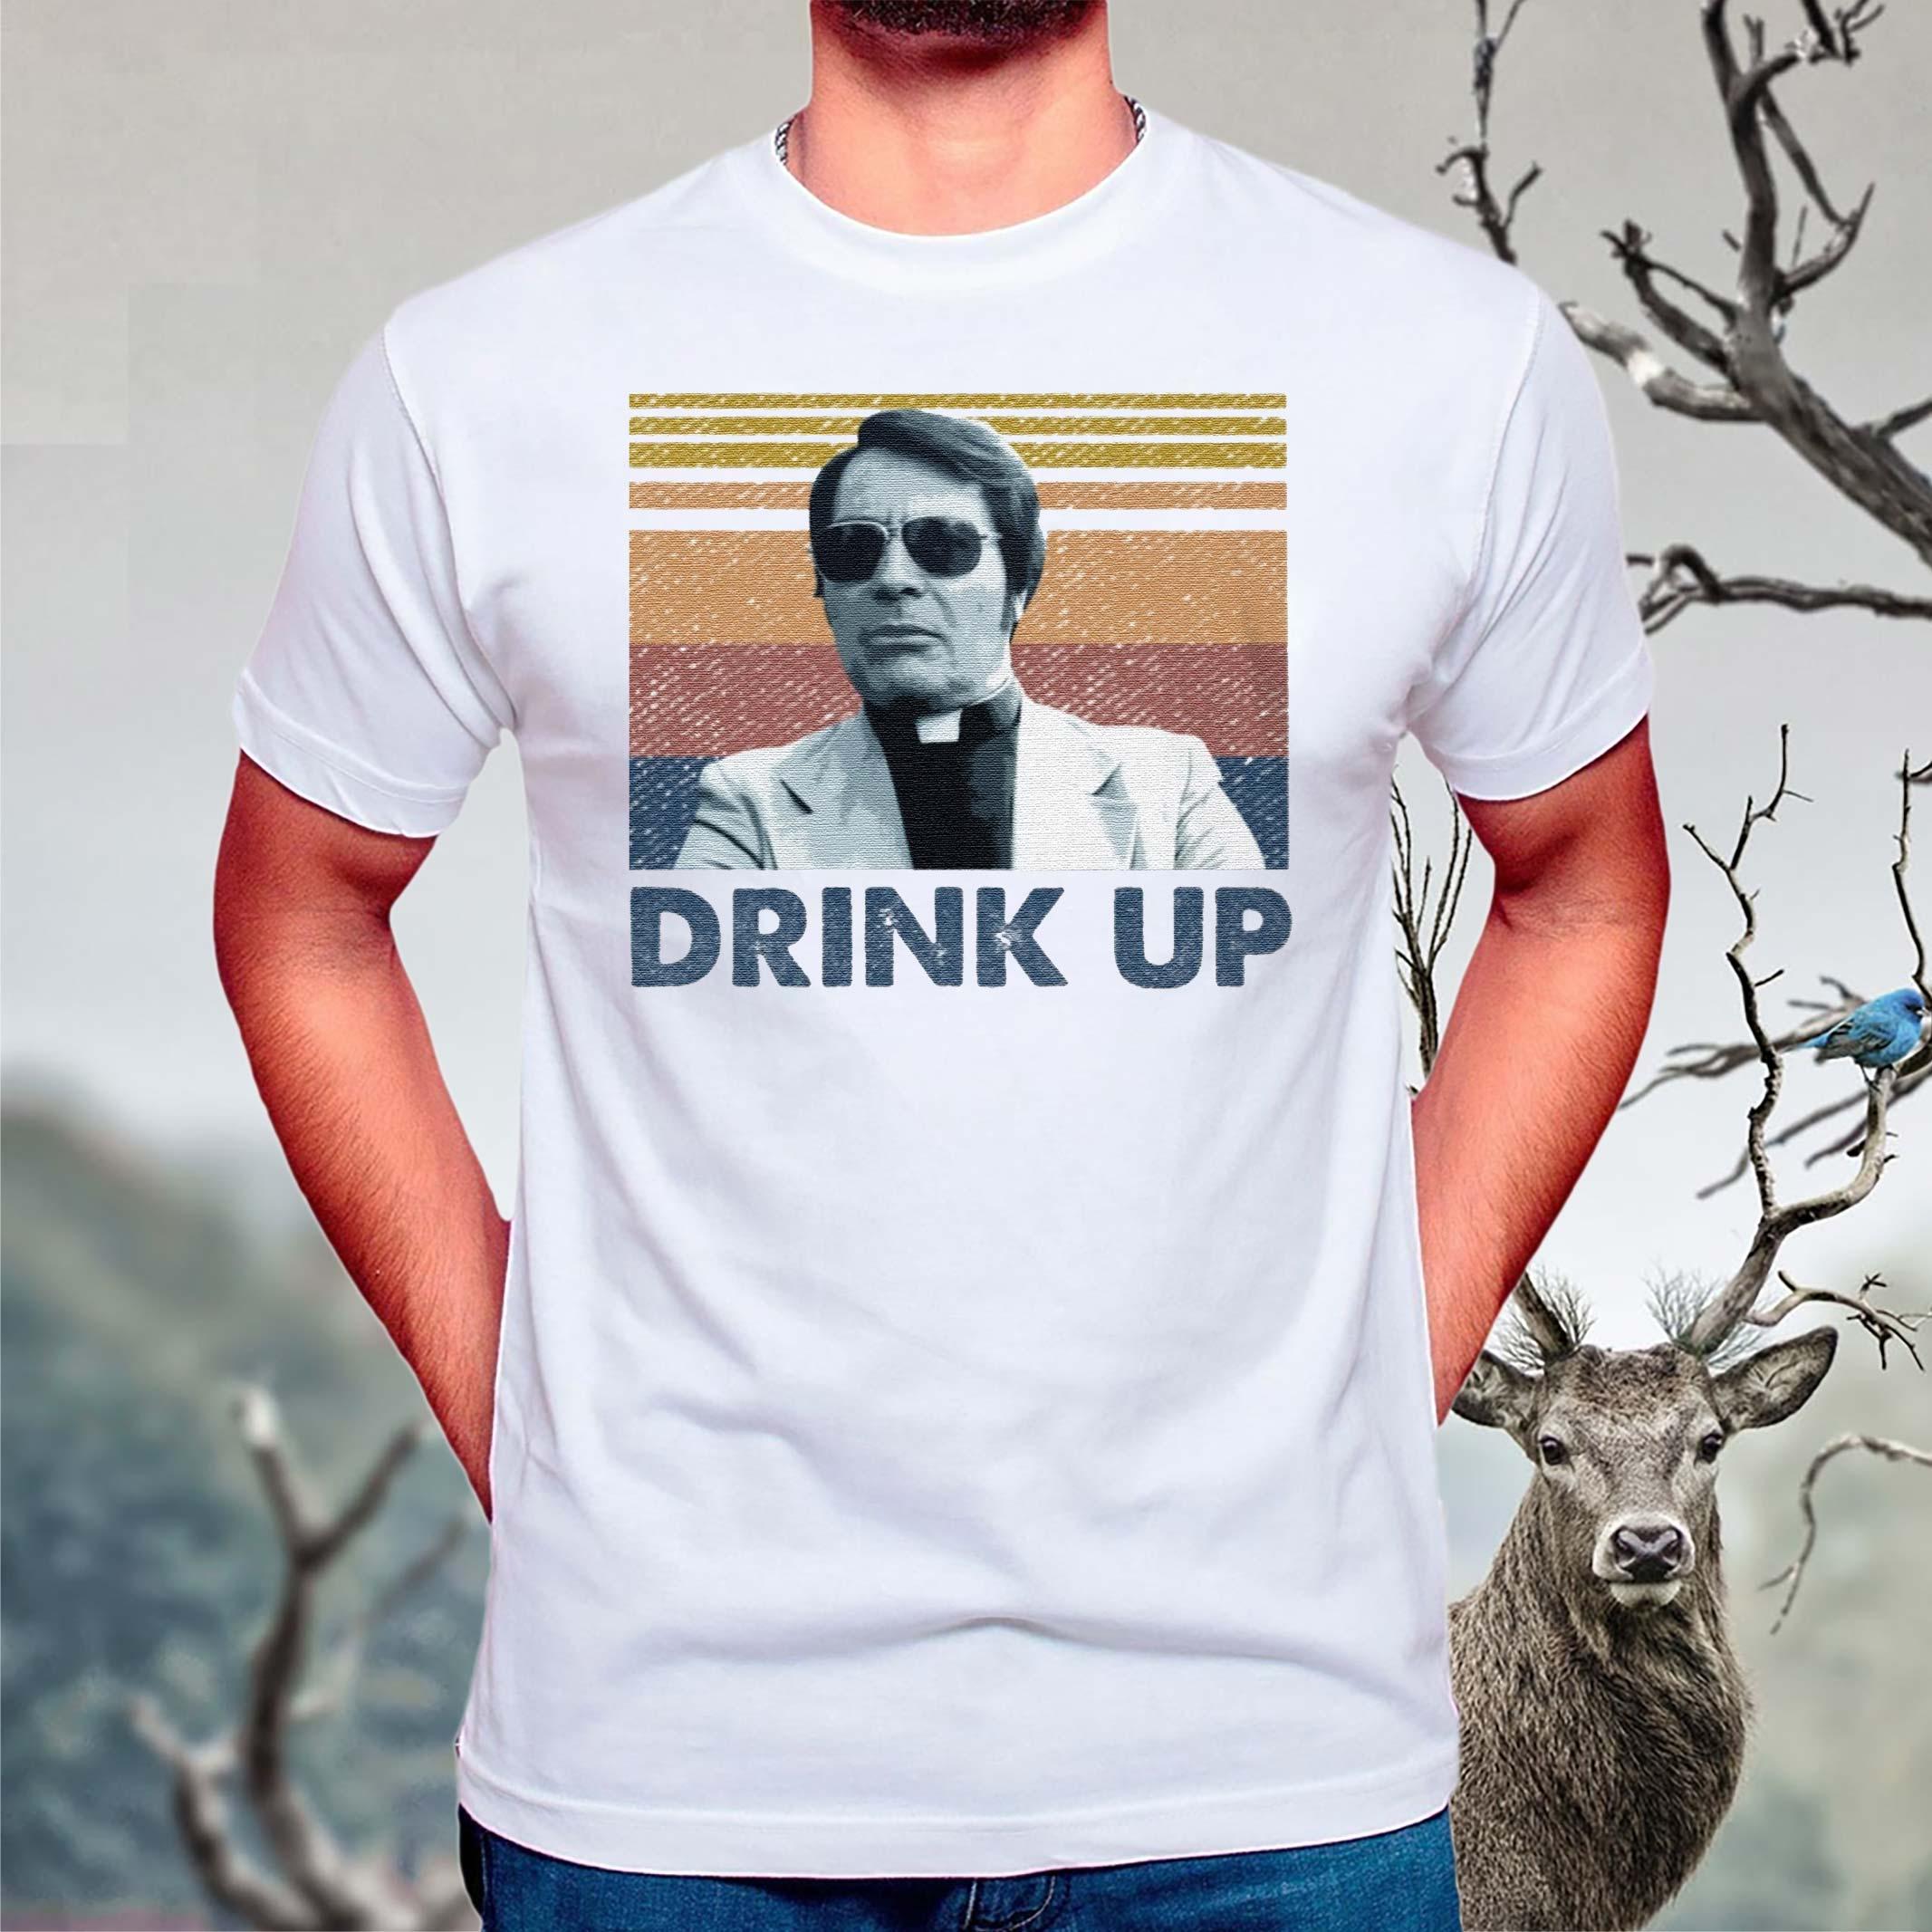 Jim-Jones-Drink-Up-Shirts